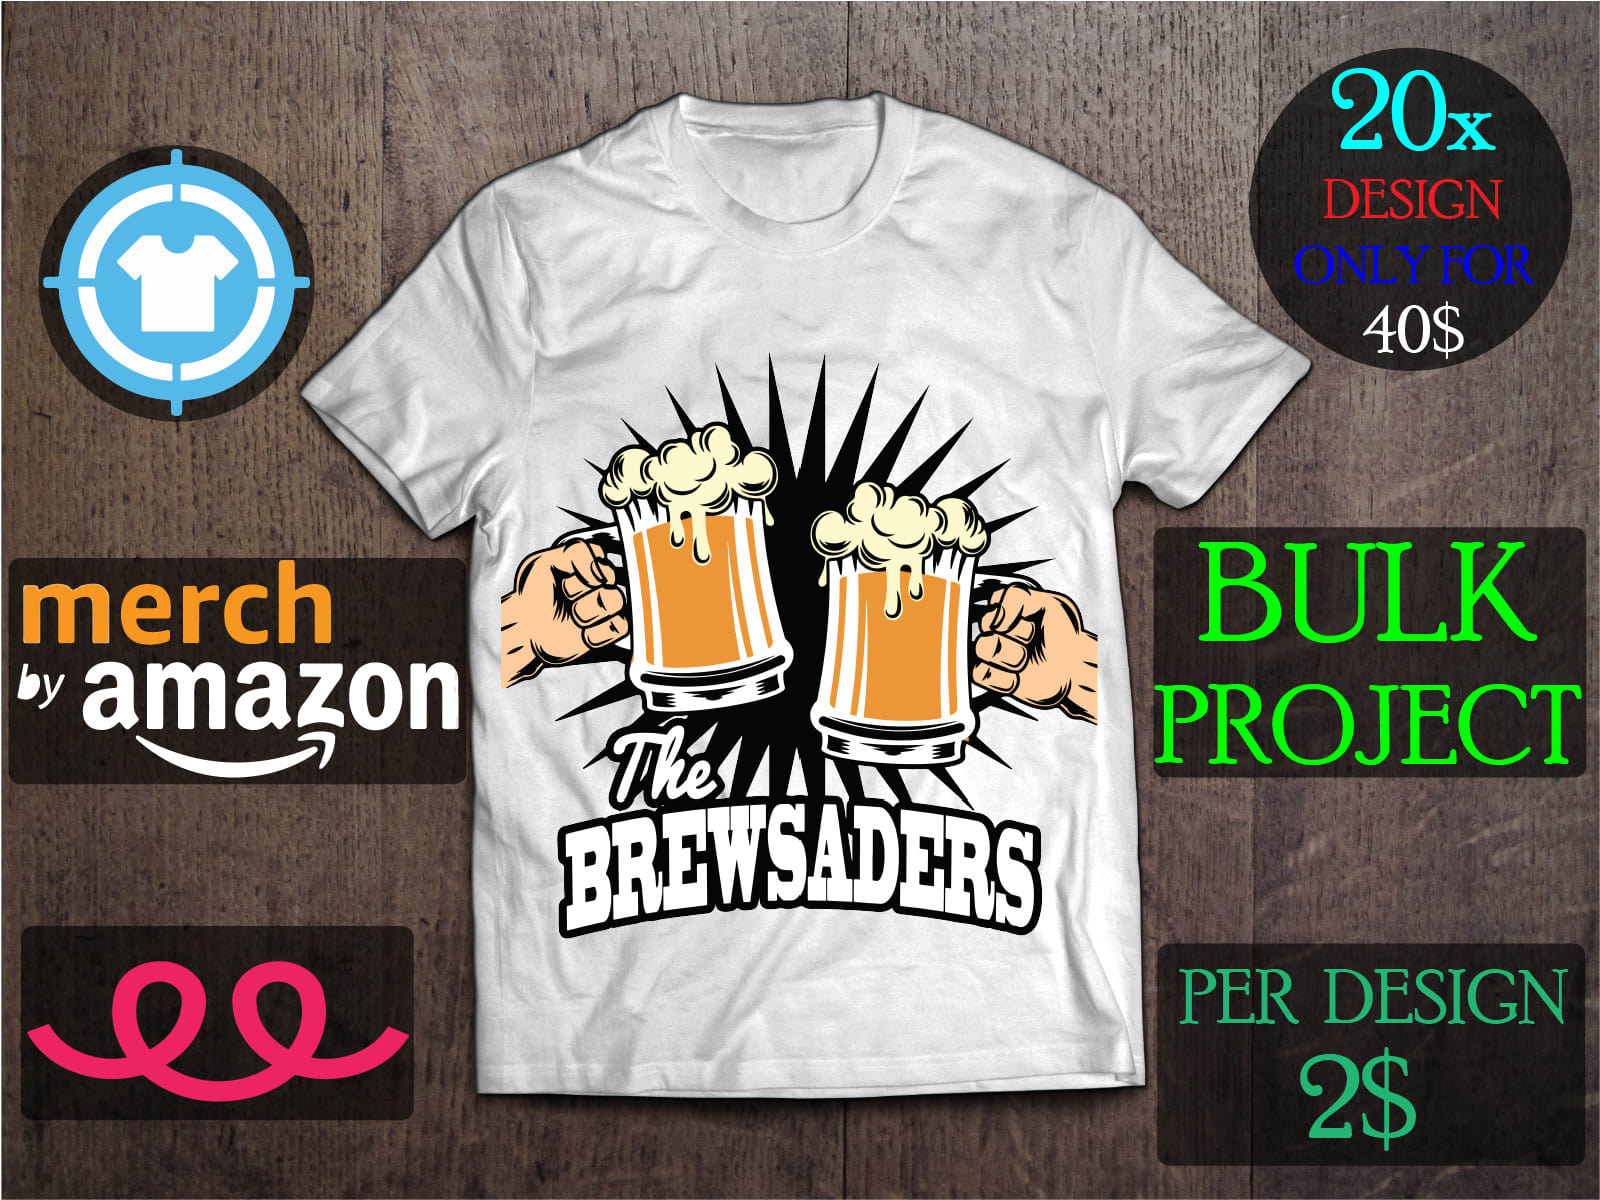 edff5970 Cheapest Custom T Shirts - raveitsafe